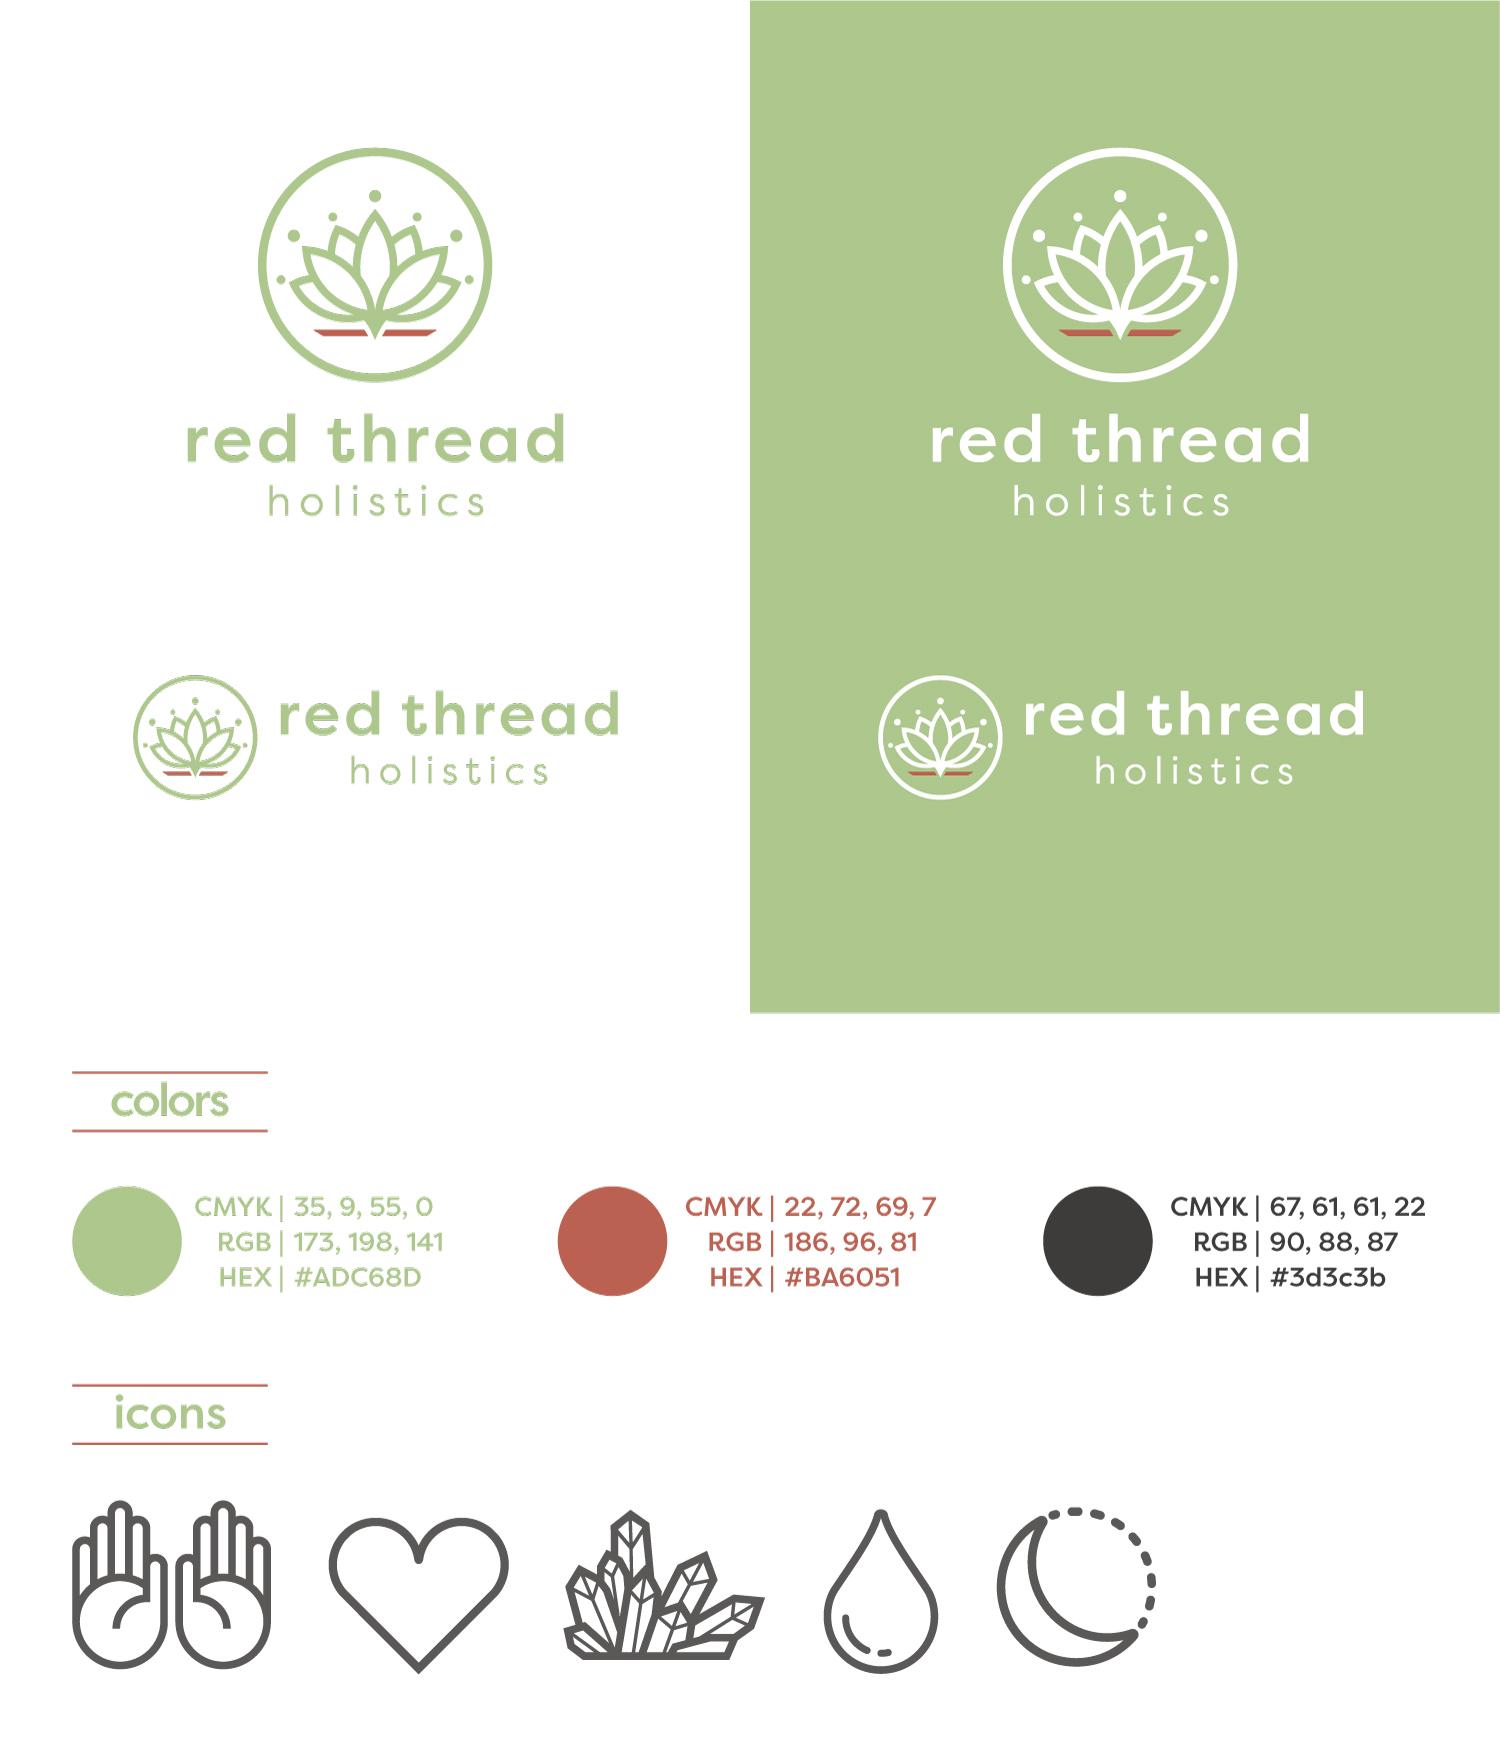 red_thread_logo_finals.jpg